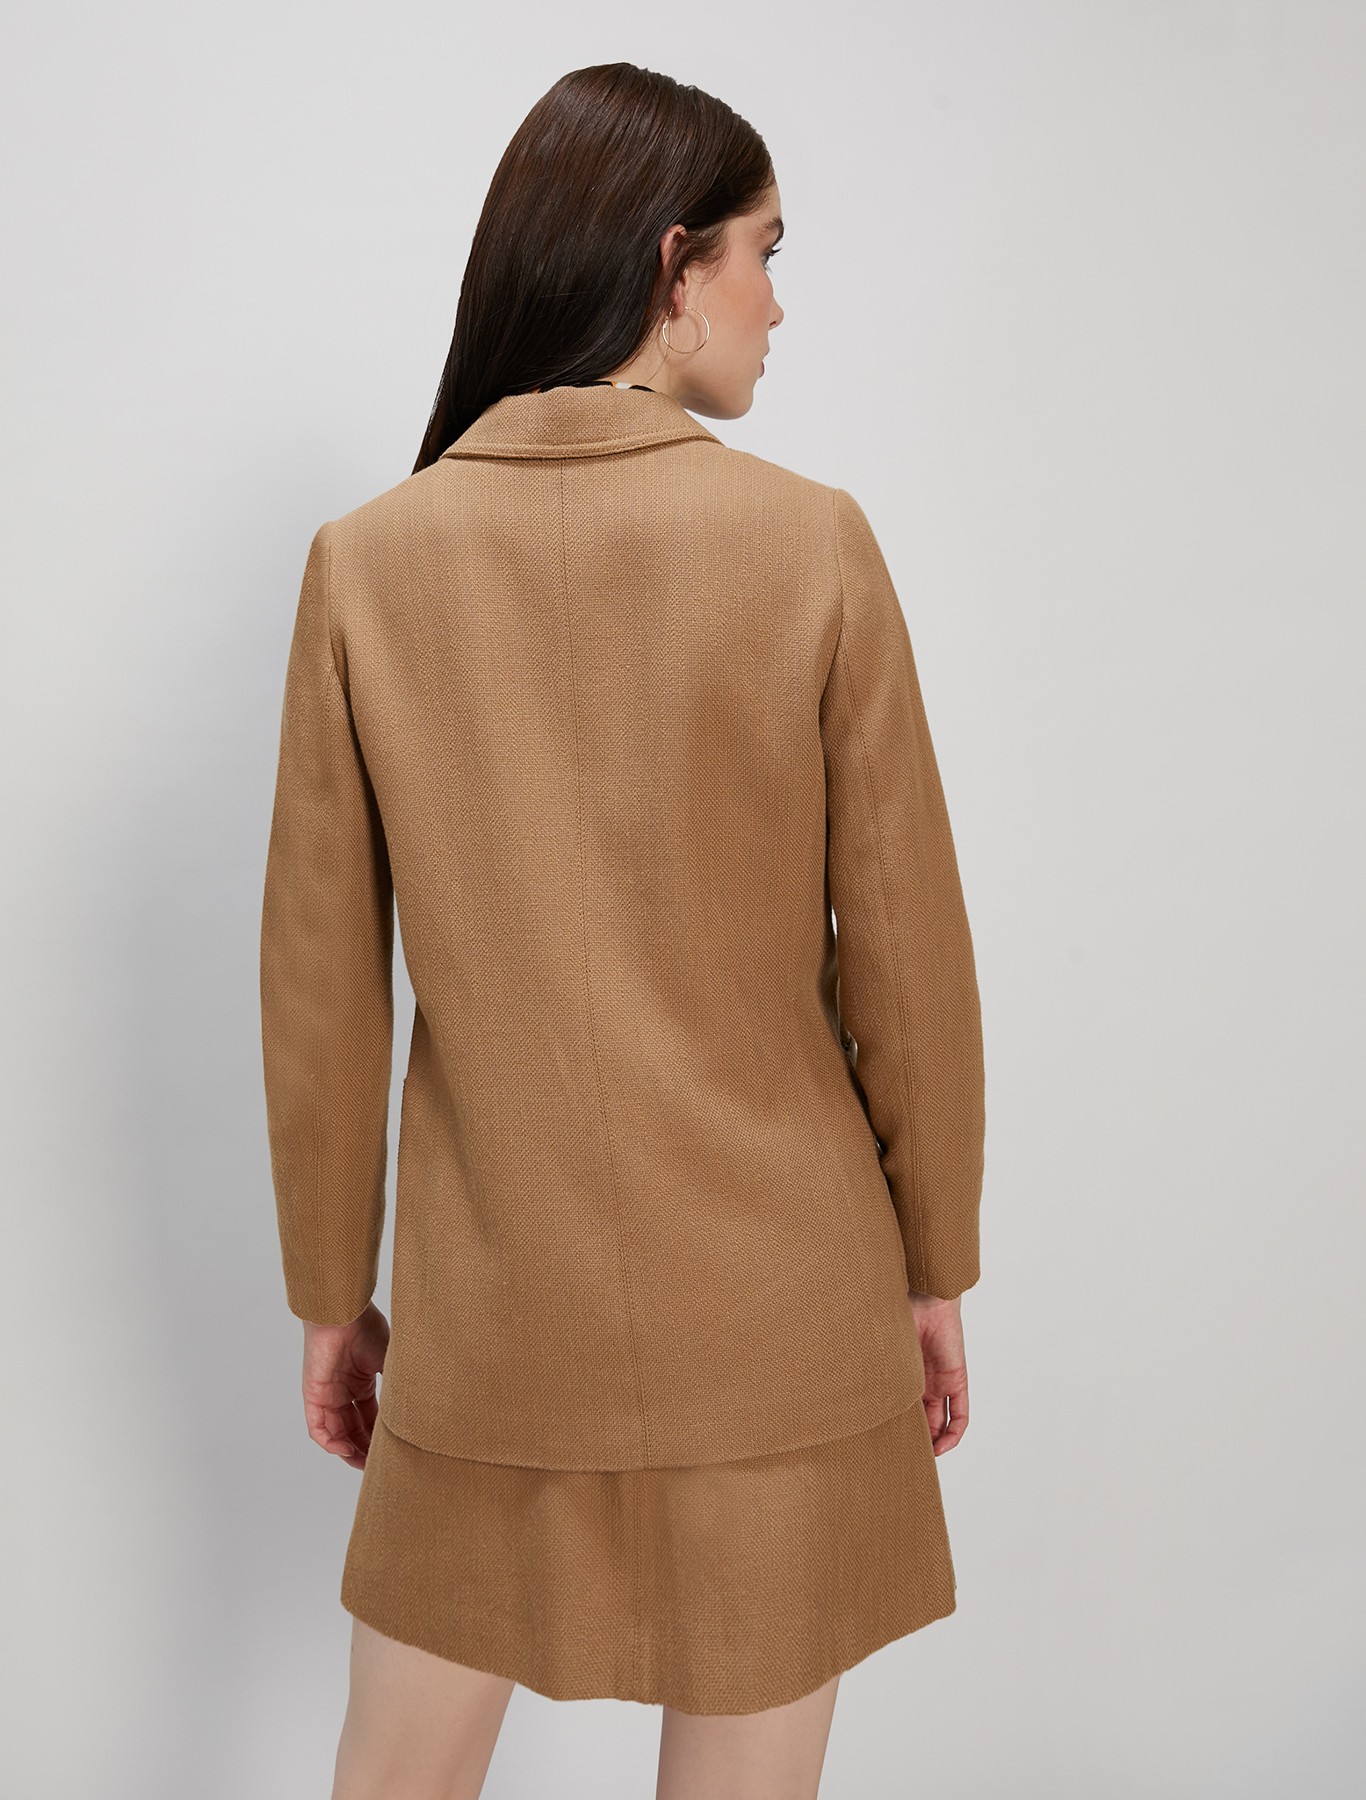 Basketweave blazer - camel - pennyblack